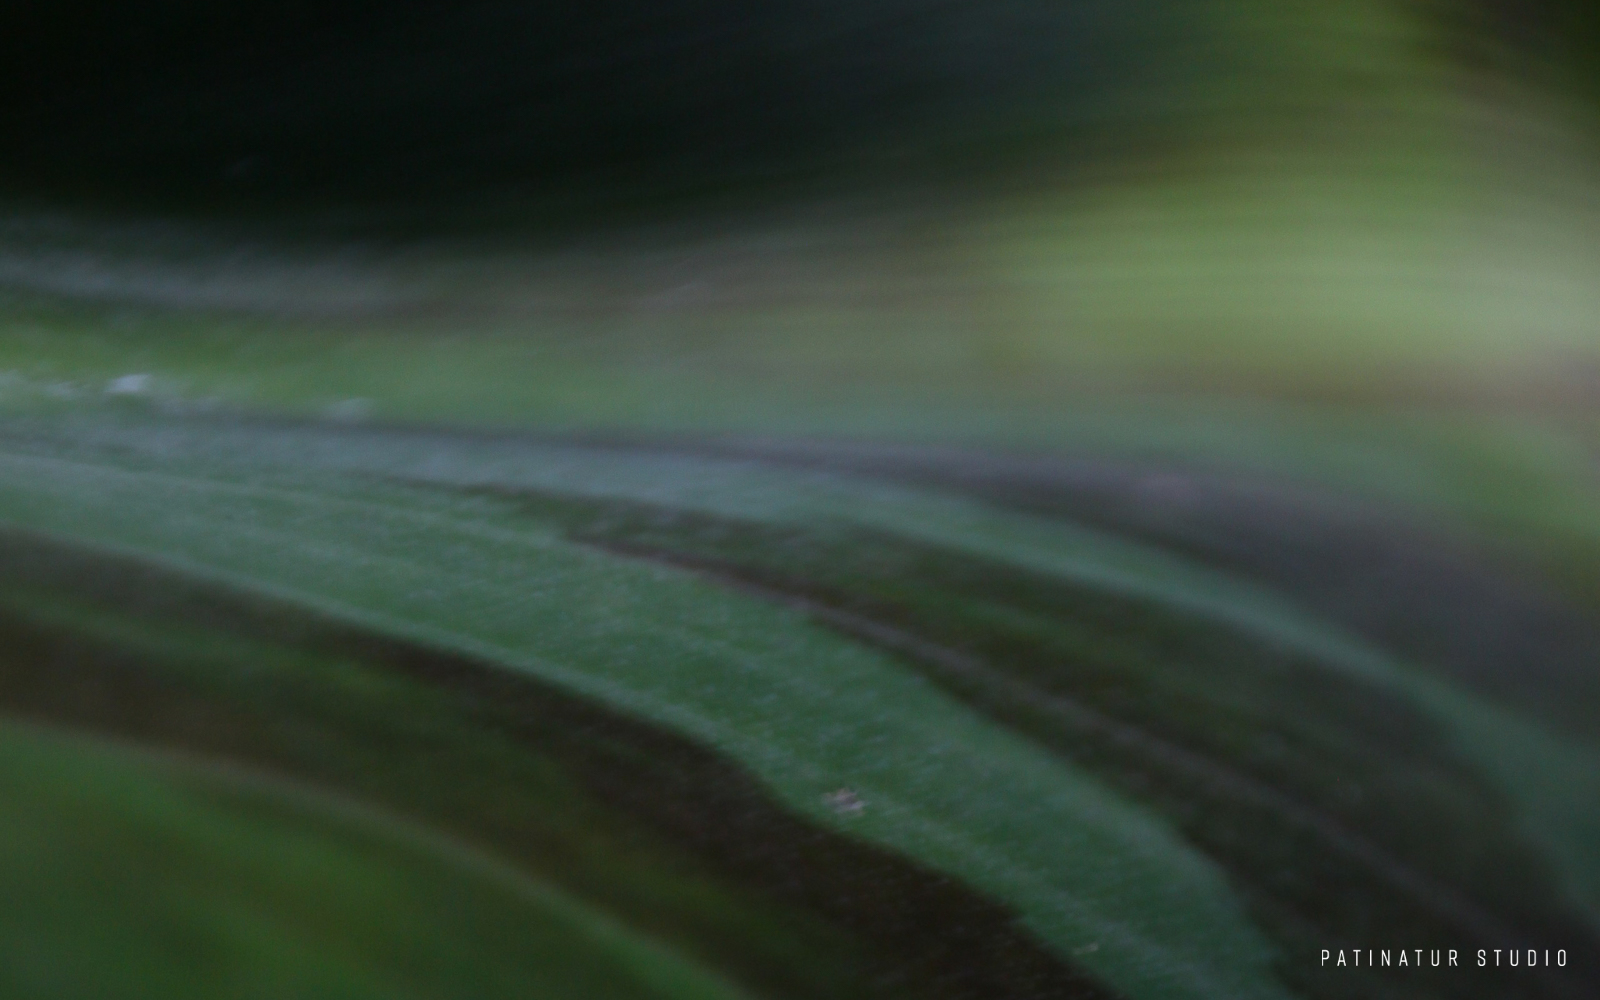 Photo art | Abstract close-up of a banana leaf.